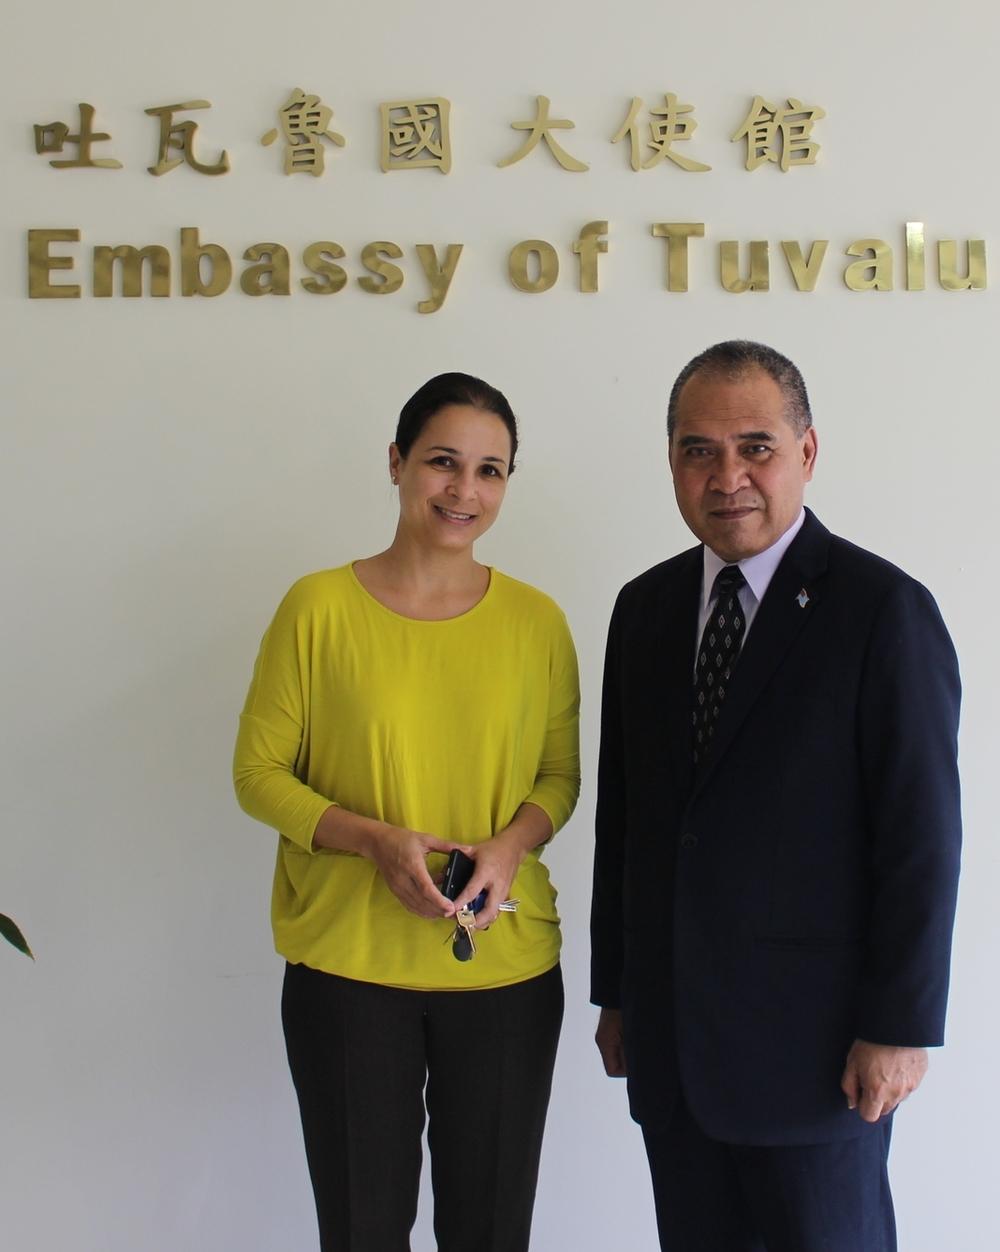 Ambassador Minute Alapati Taupo and Ambassador Rachel Coupaud/陶敏德大使與庫珀大使